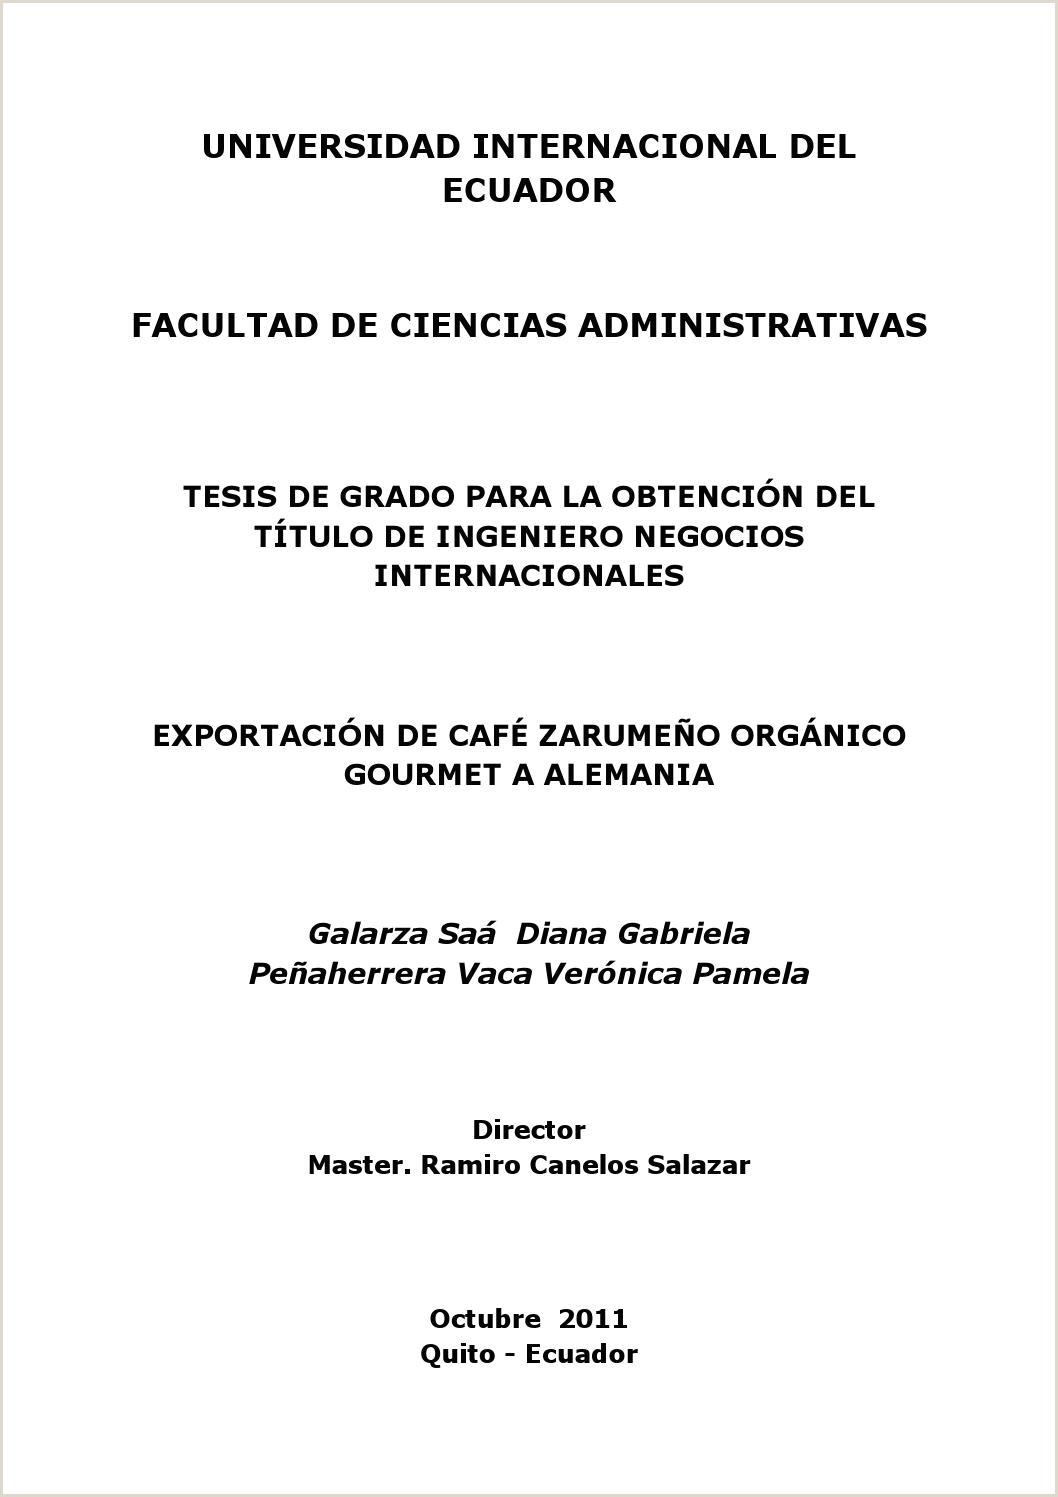 Formato Hoja De Vida Minerva 10-00 Para Llenar T Uide 0037 1 by Alejandra Ca±ar Castro issuu